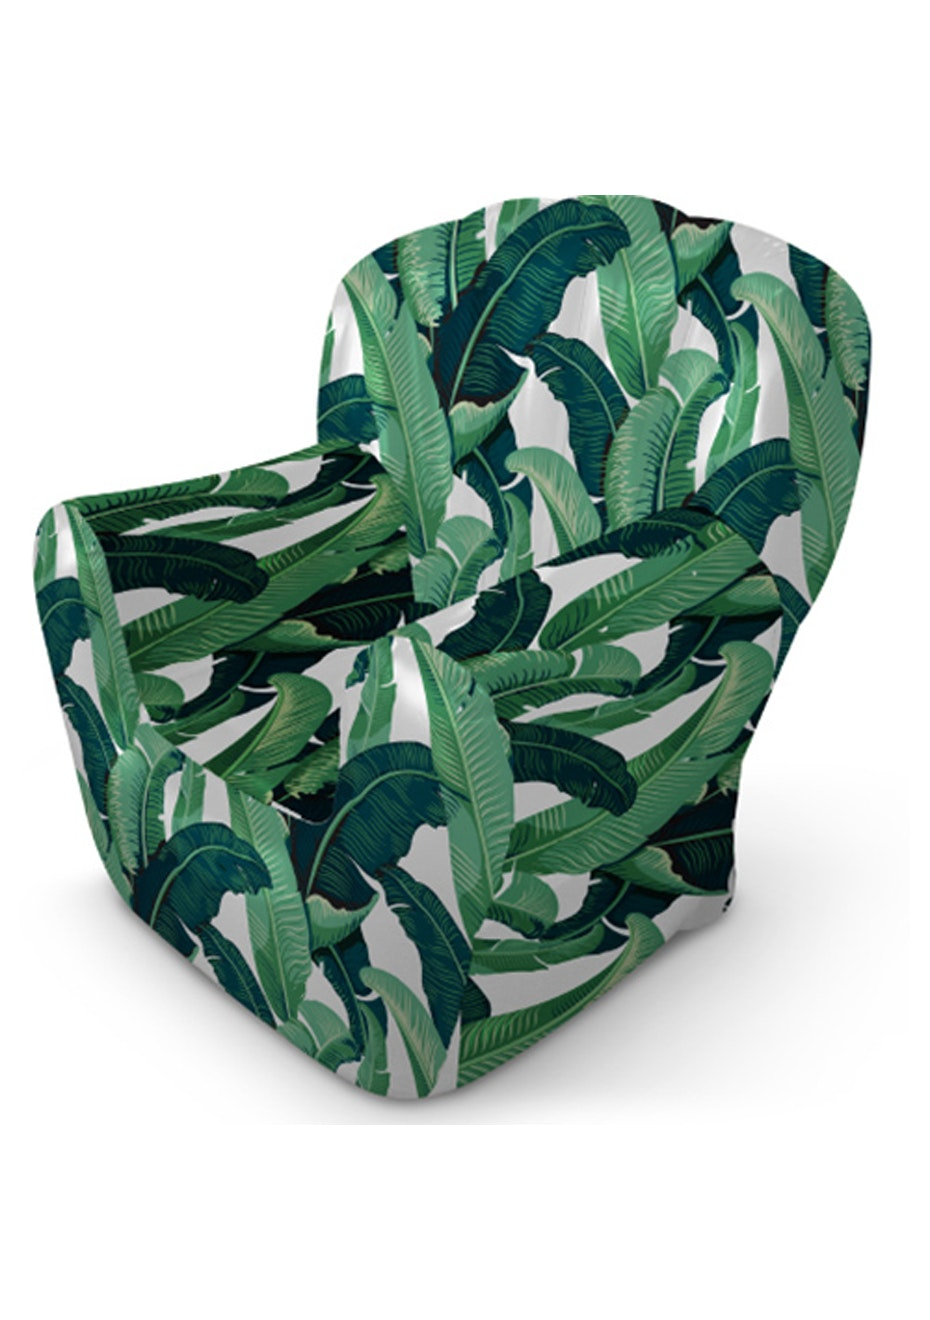 Sunnylife - Inflatable Chair Banana Palm